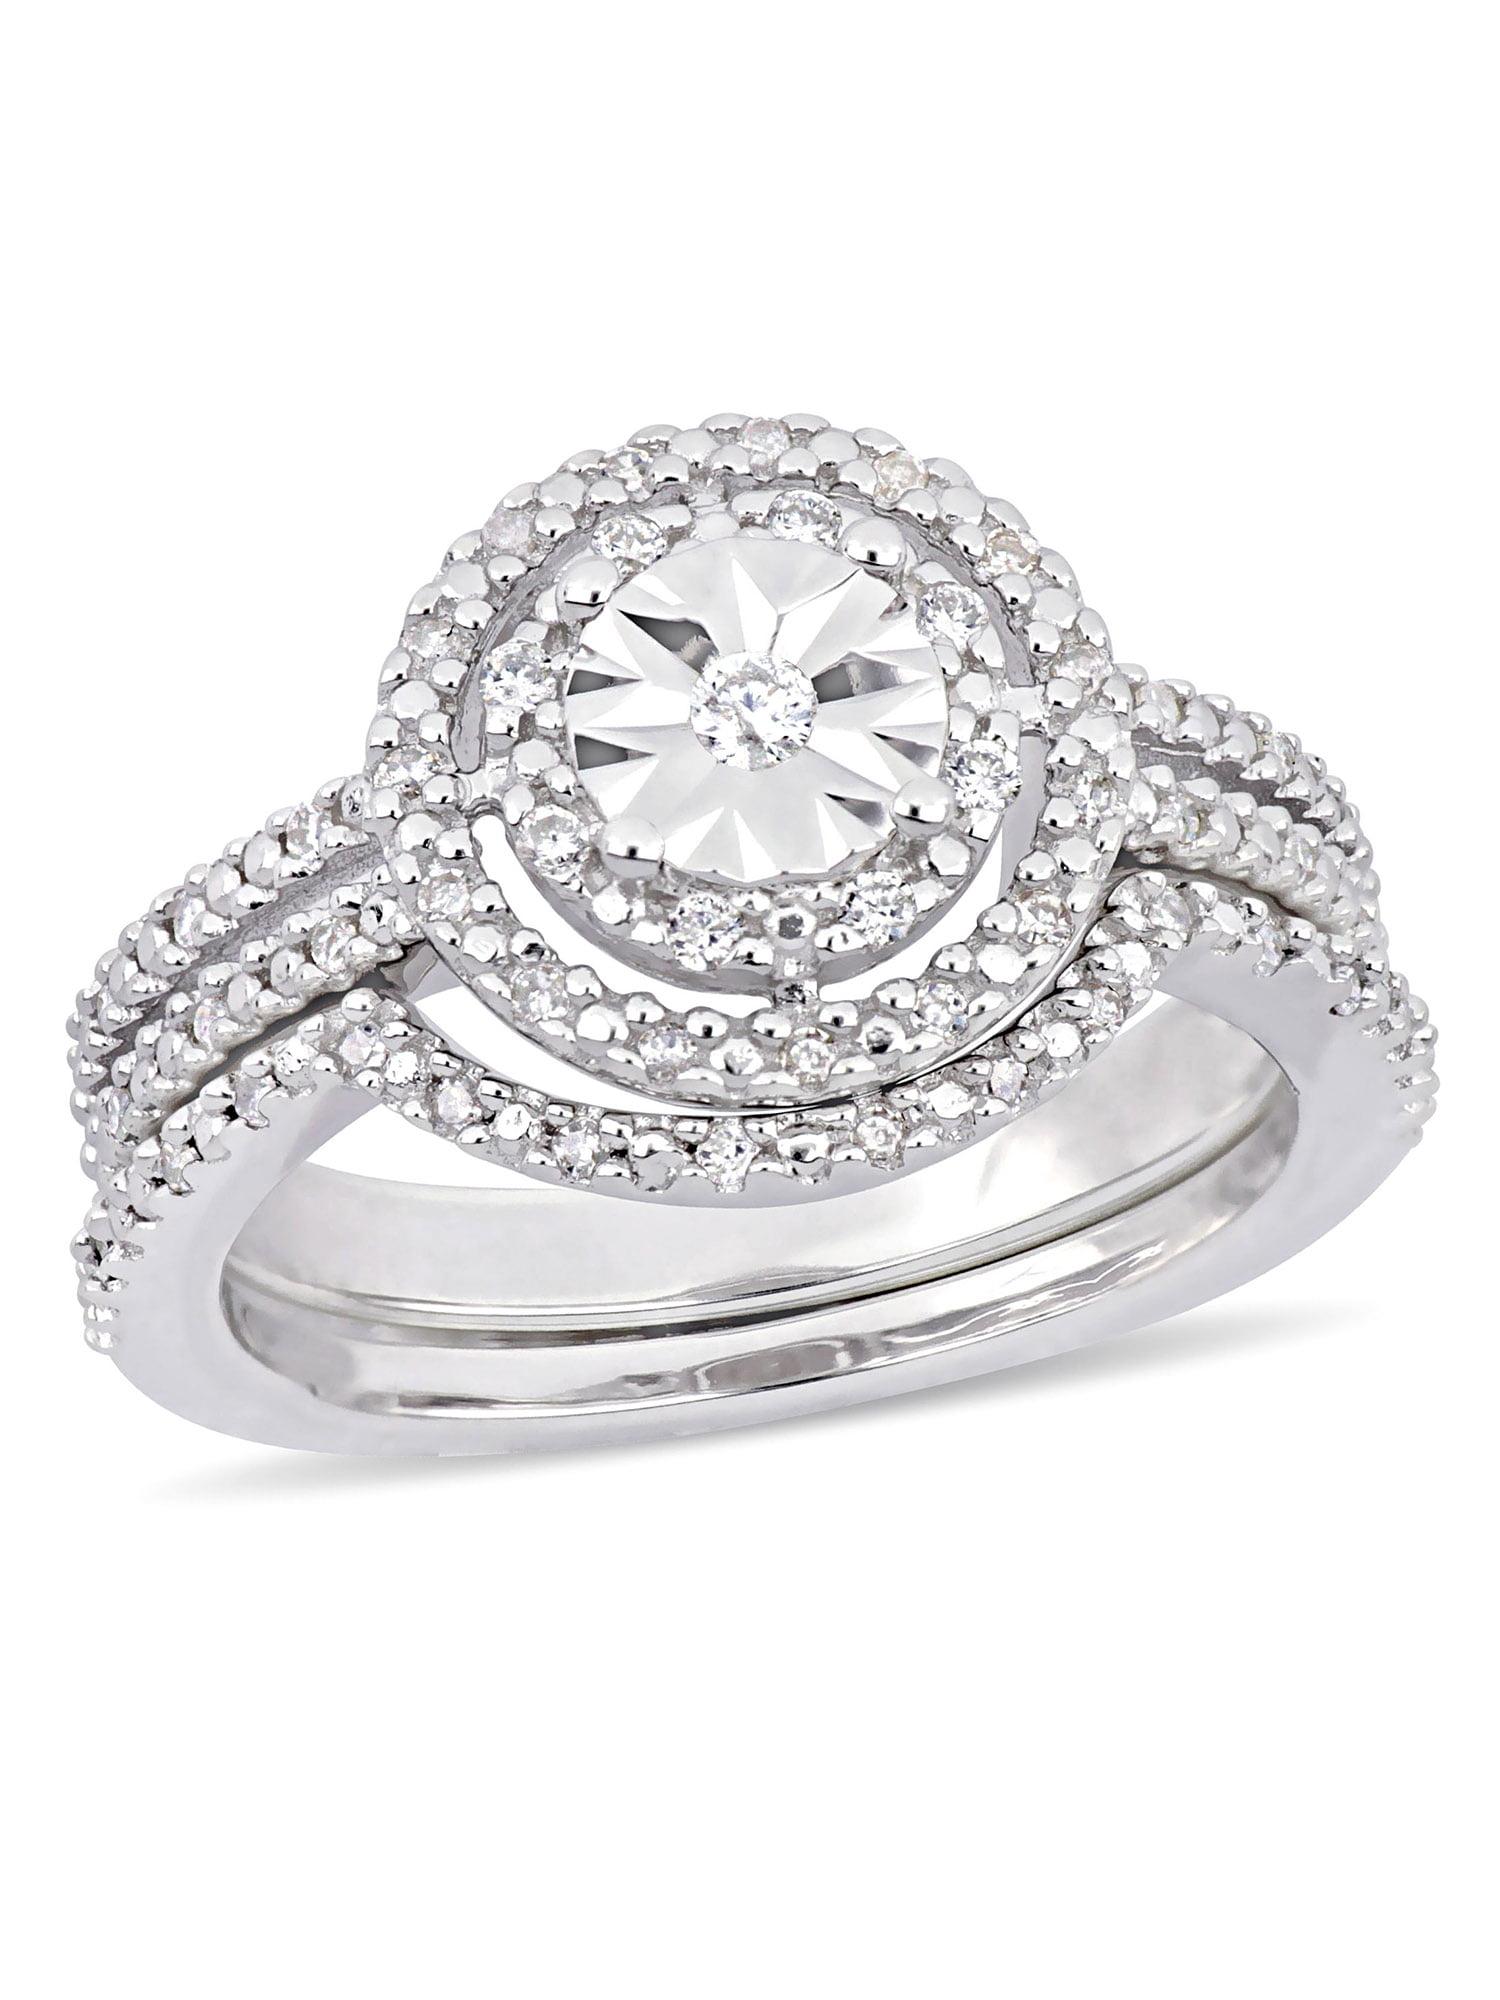 Miabella 1 4 Carat Diamond Sterling Silver Double Halo Bridal Set by Delmar Manufacturing LLC